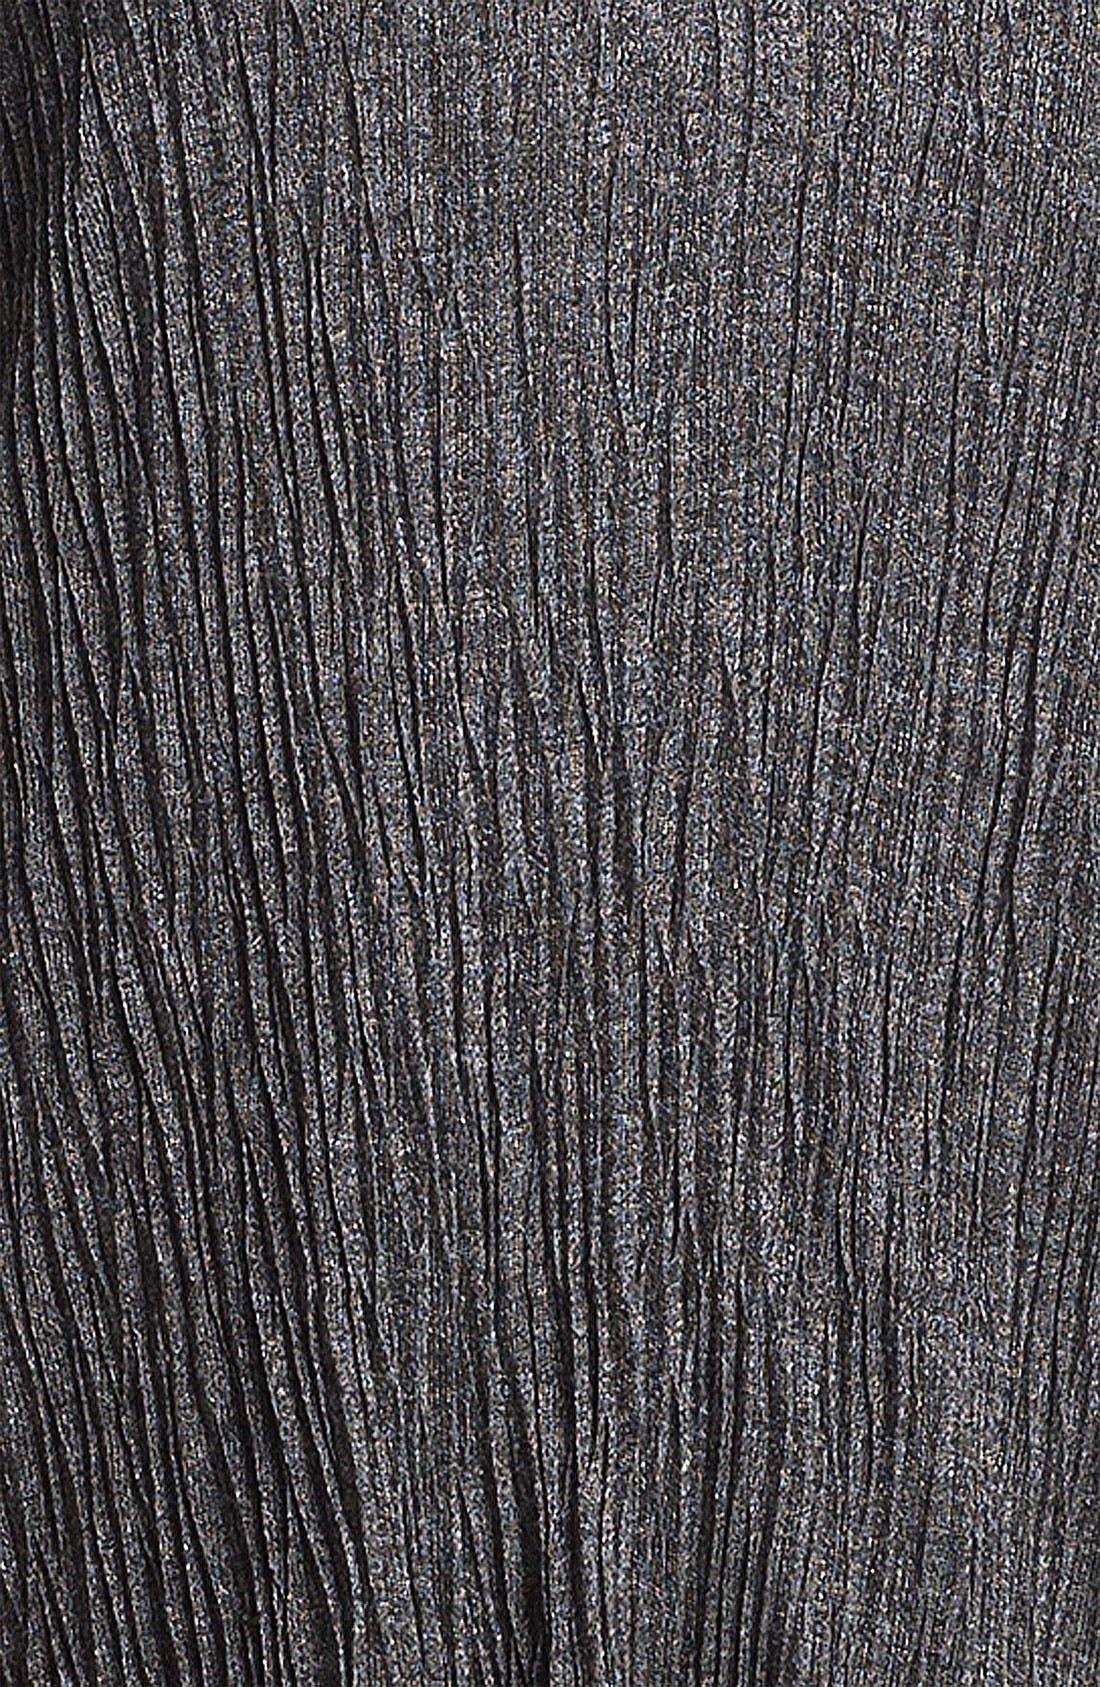 Alternate Image 3  - Eileen Fisher Crinkled Tunic (Plus Size)